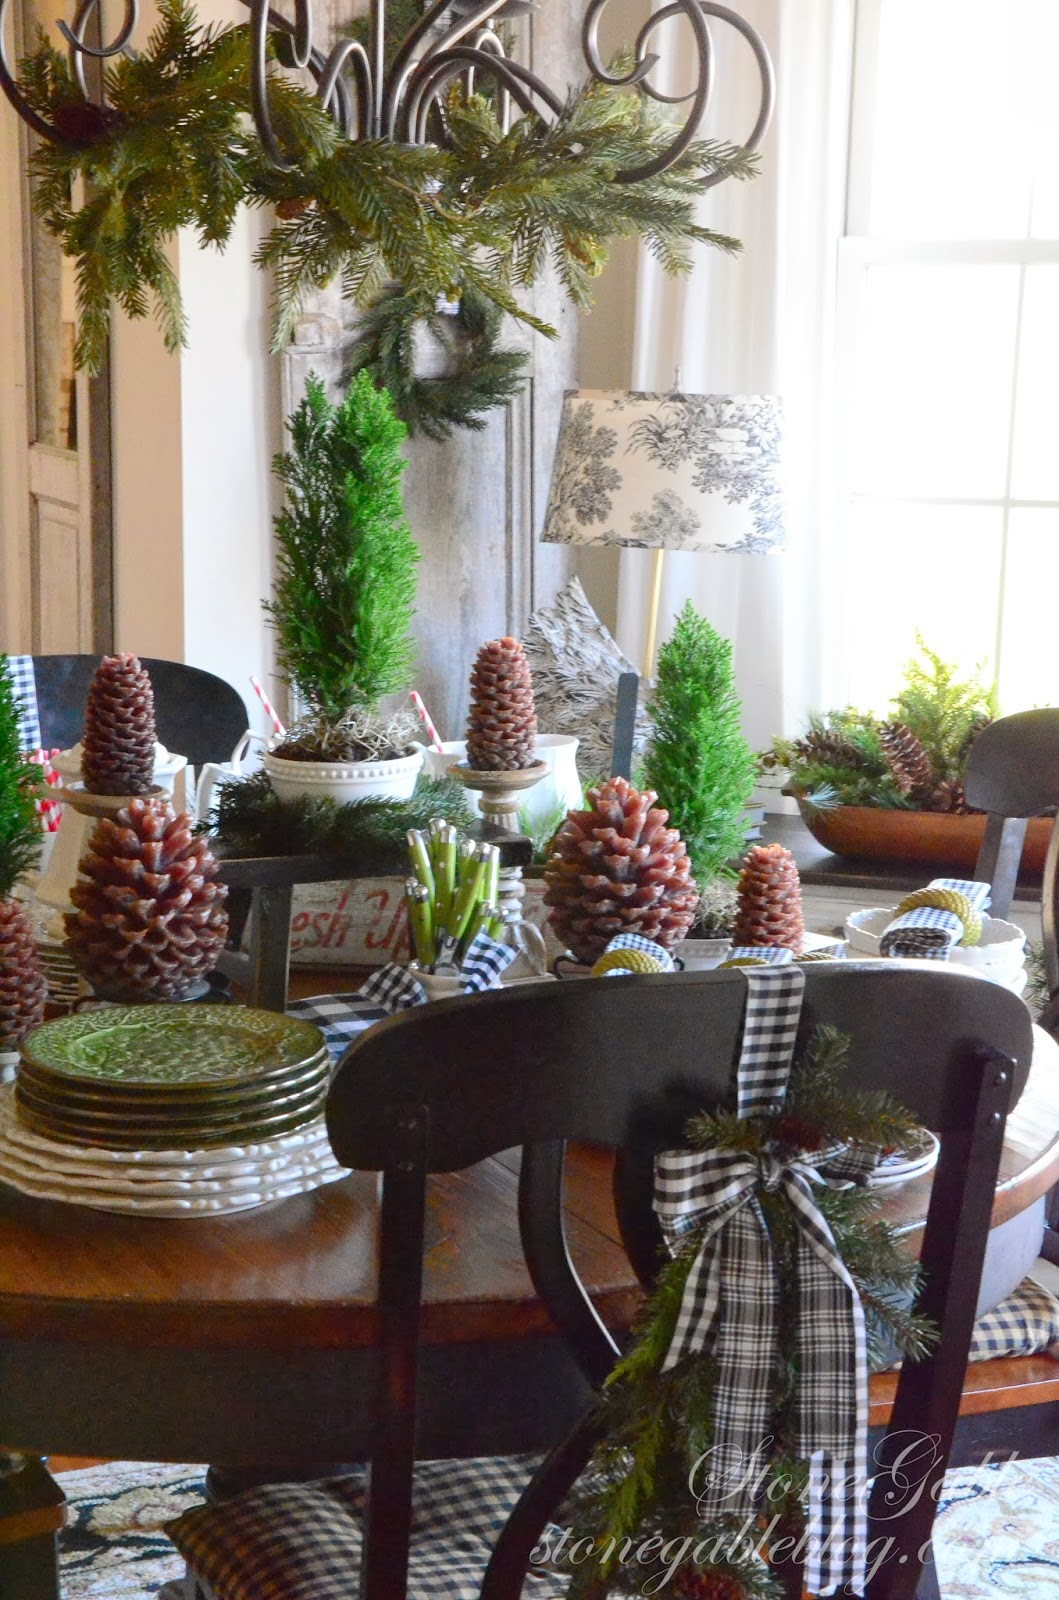 a farmhouse christmas stonegable - A Farmhouse Christmas